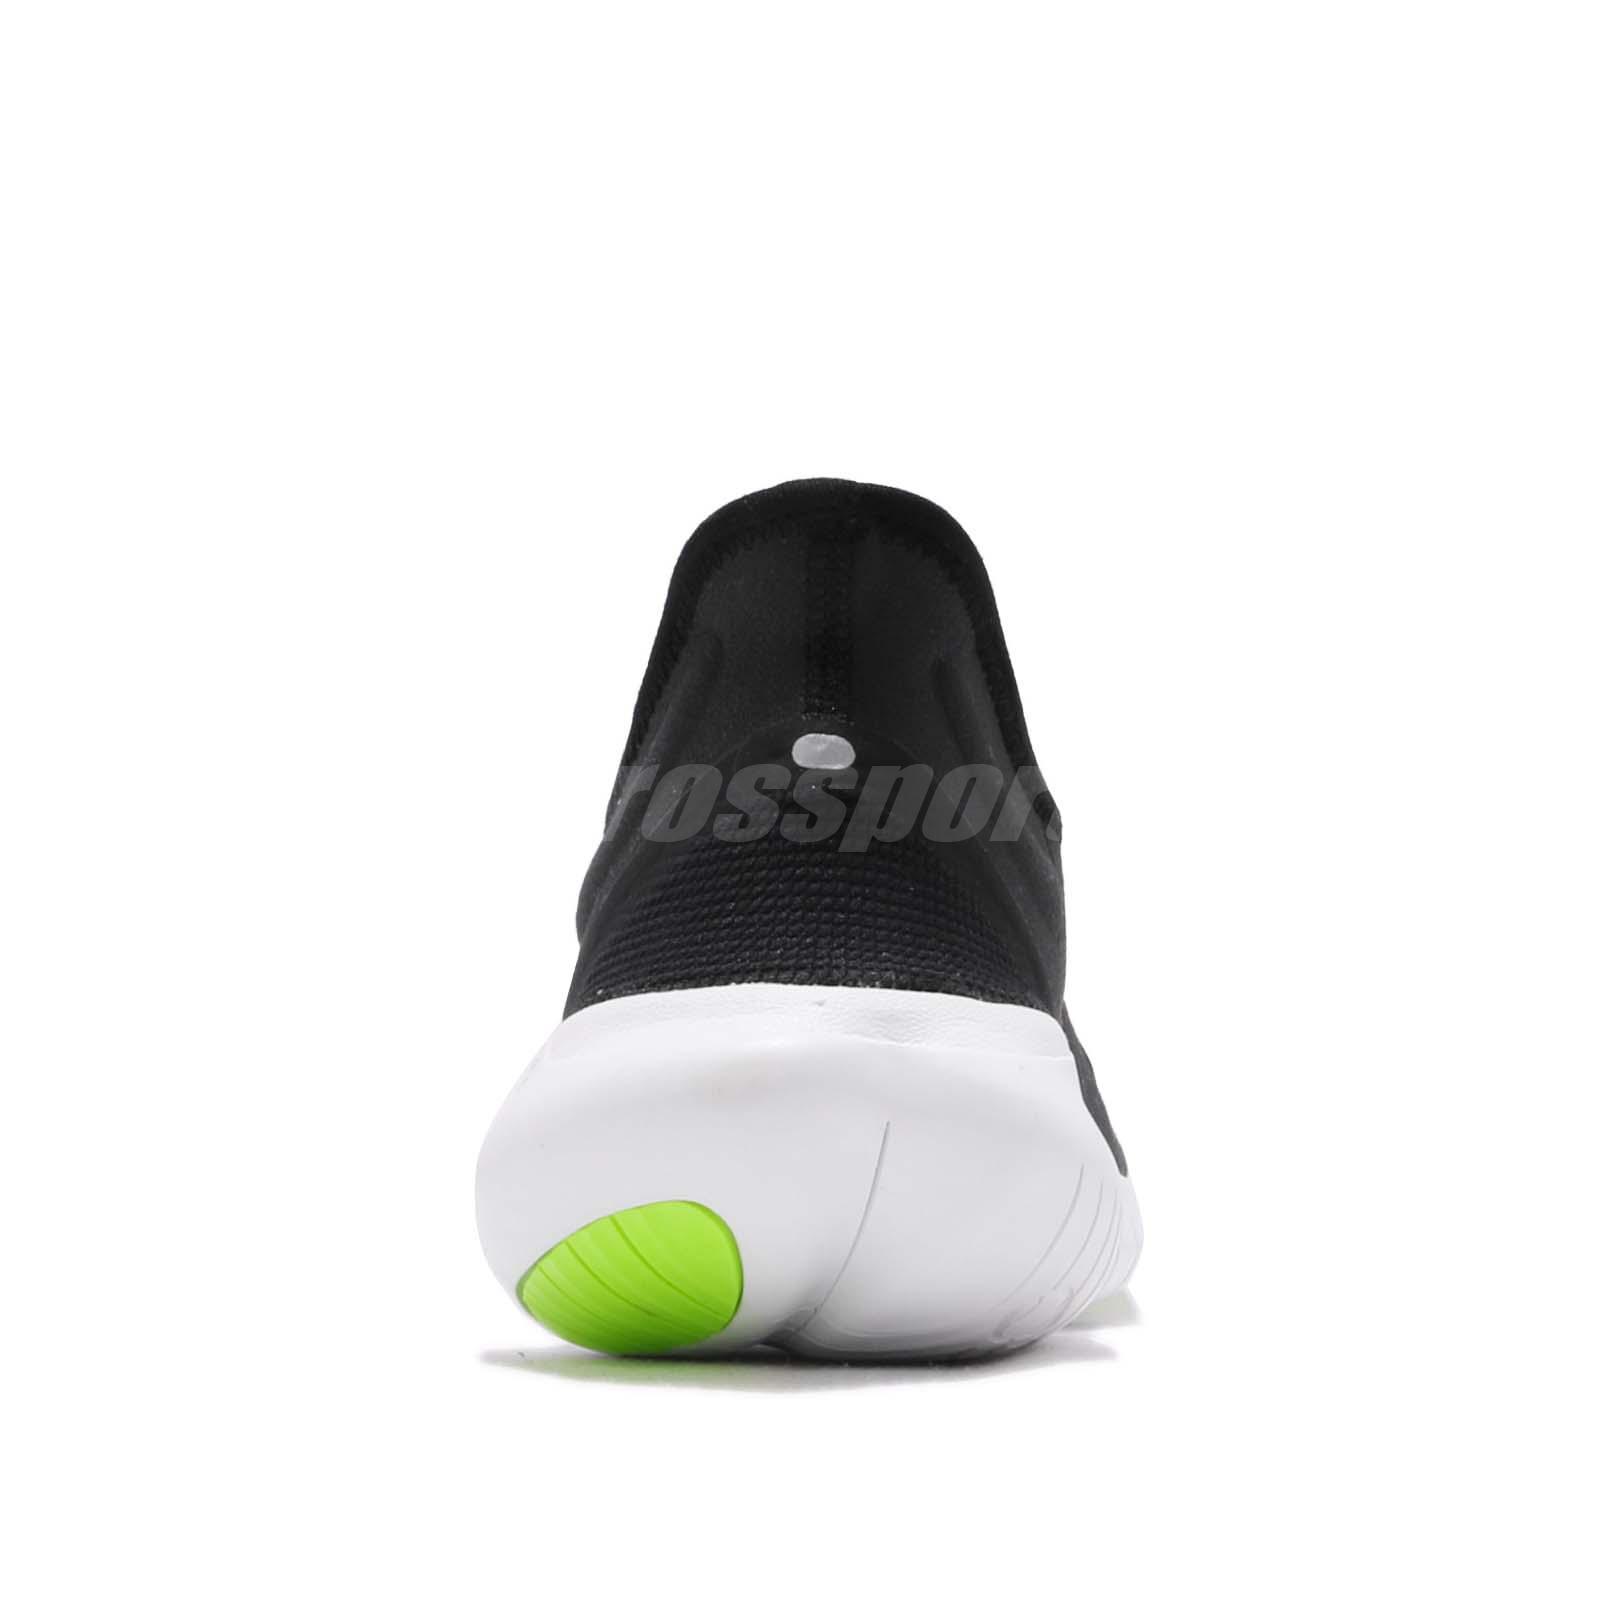 827b80eb645f Nike Free RN 5.0 Run Black White Volt Men Running Shoes Sneakers ...